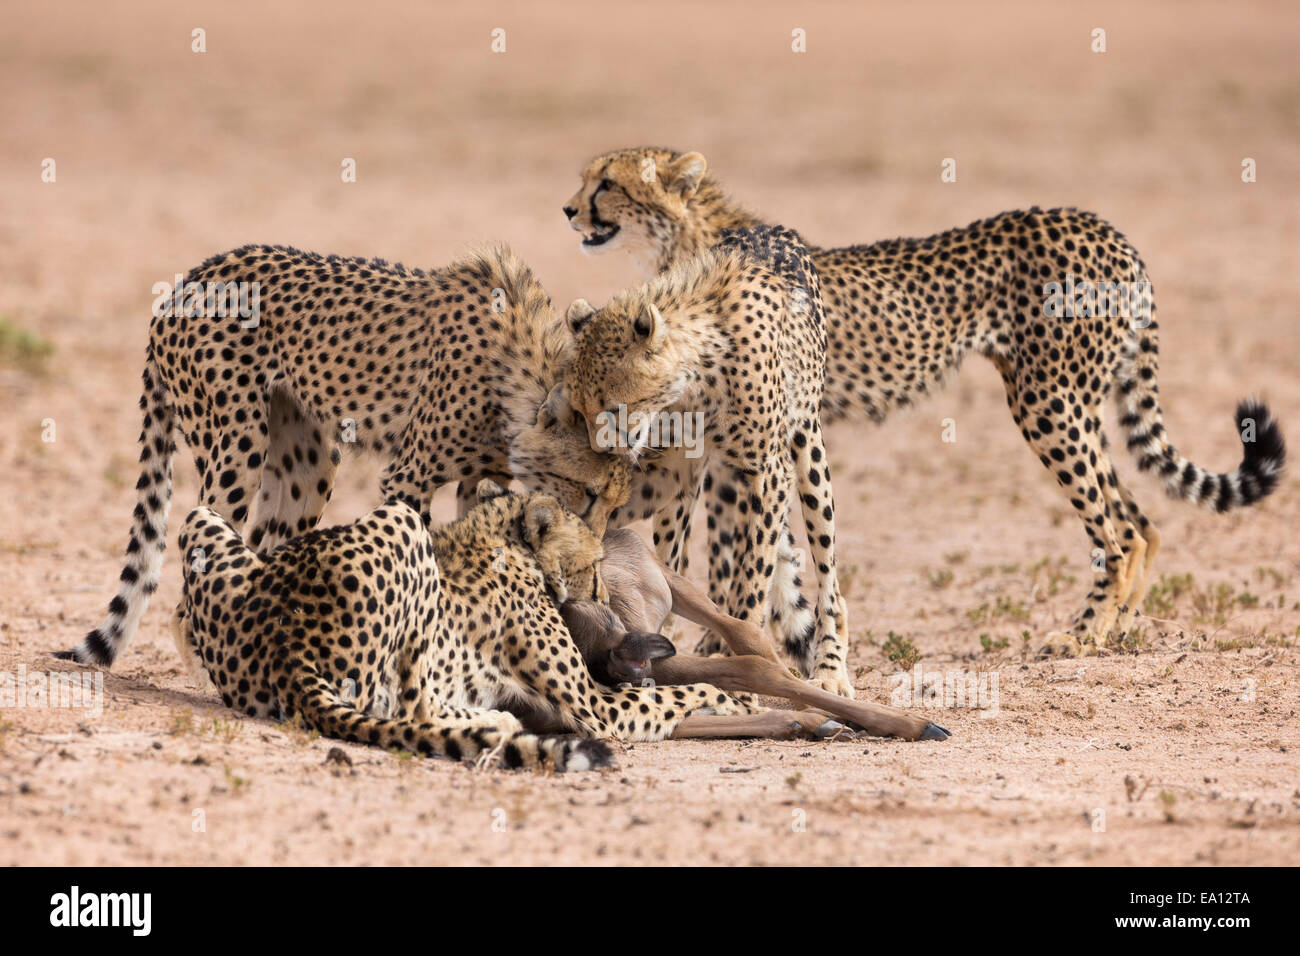 Cheetah (Acinonyx jubatus) killing baby common wildebeest (Connochaetes taurinus), Kgalagadi Transfrontier Park, - Stock Image